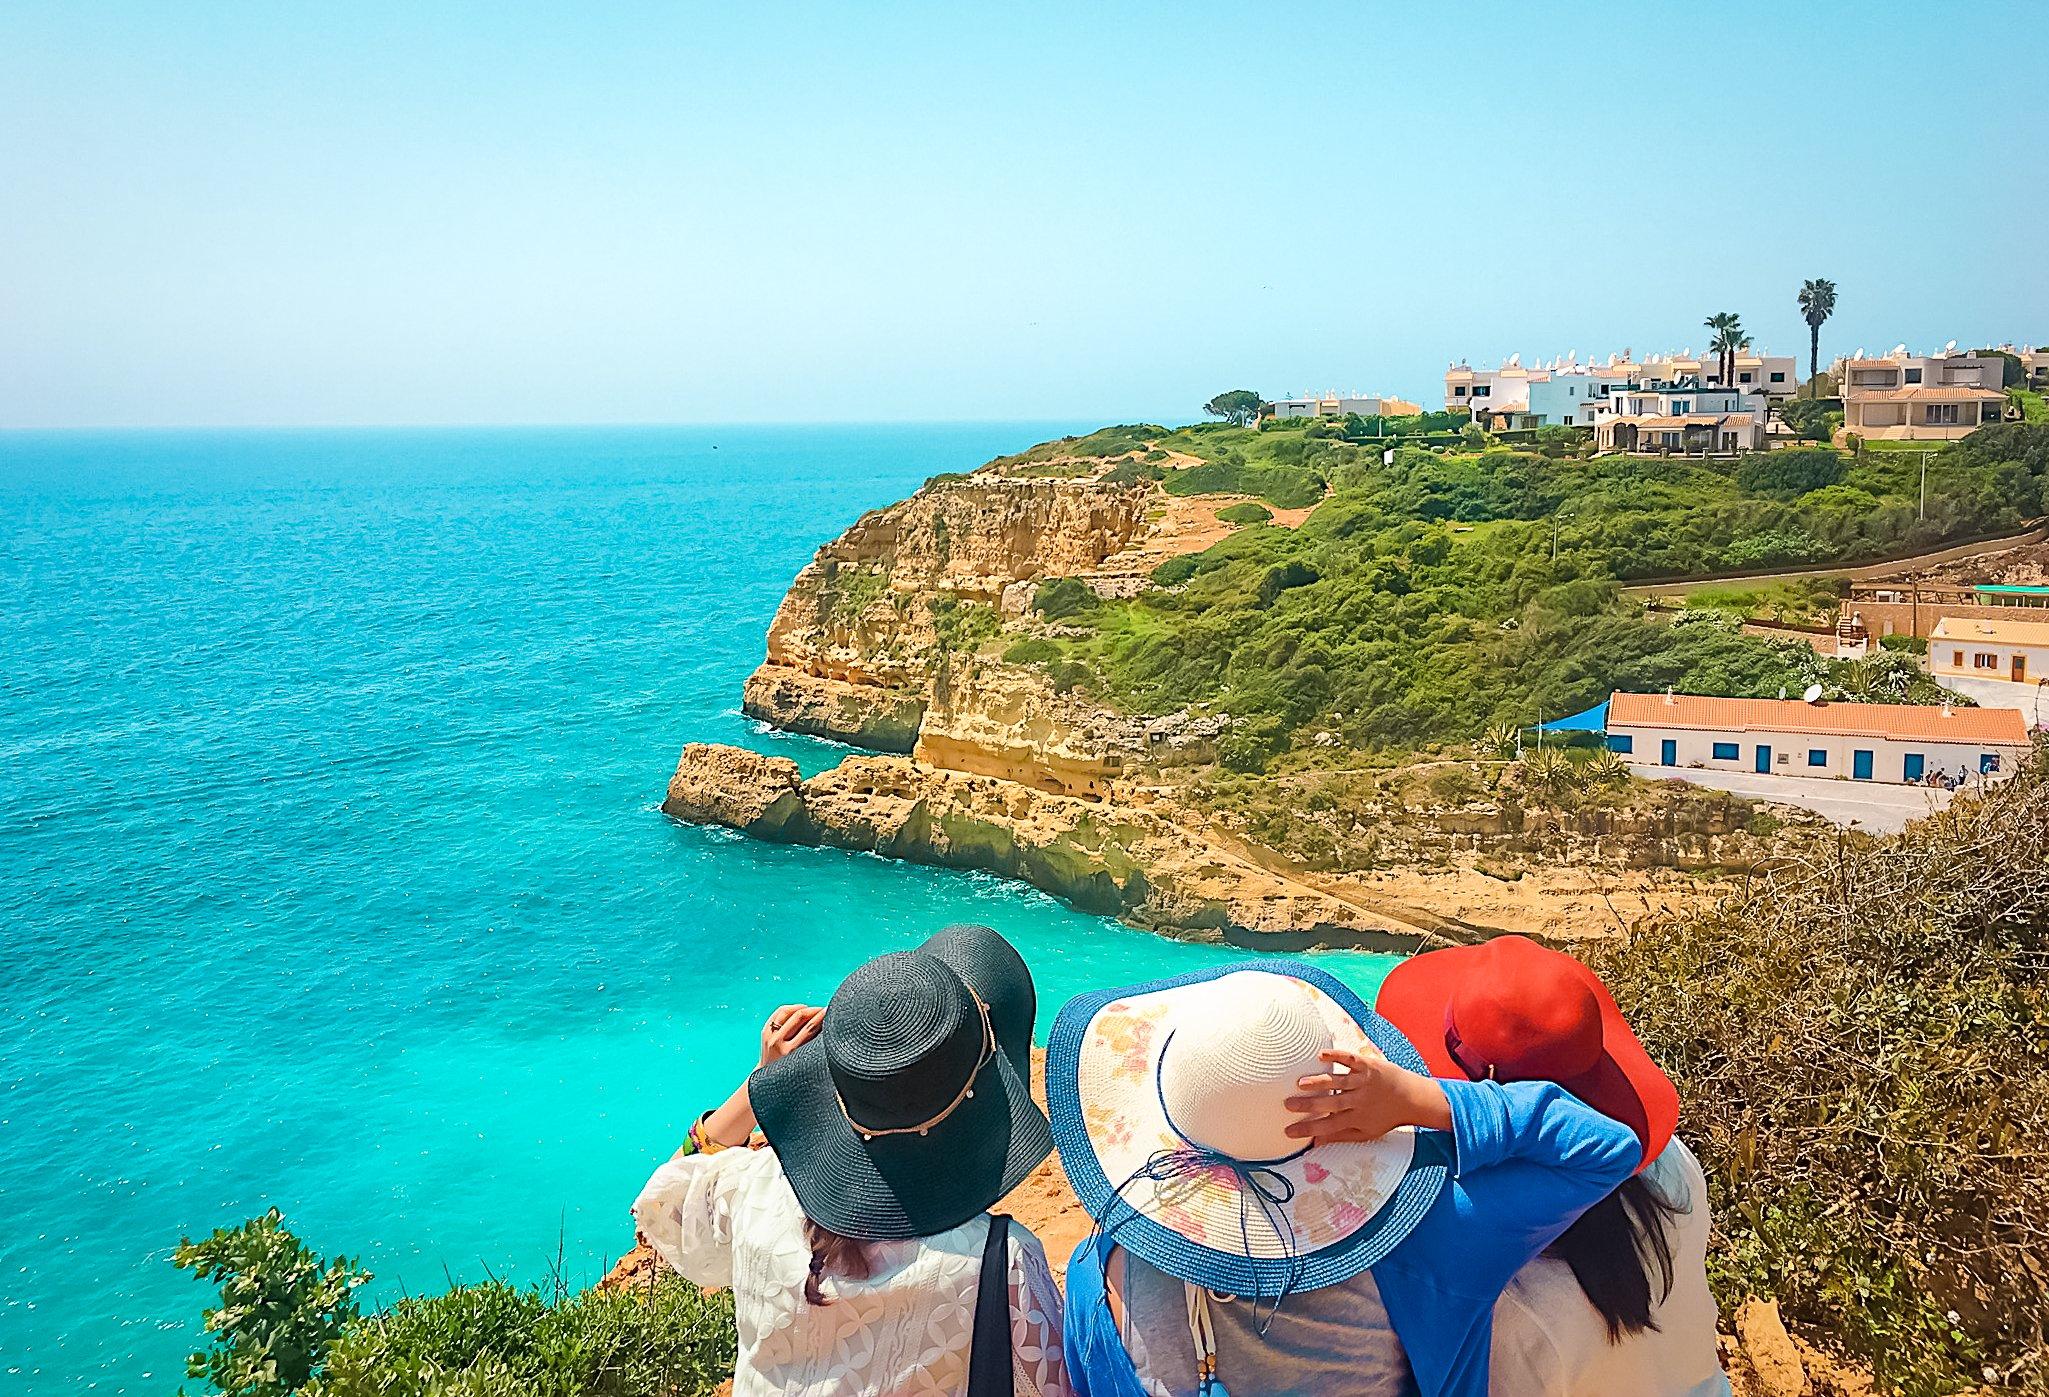 Muslim friends with floppy hats looking at Algarve beach